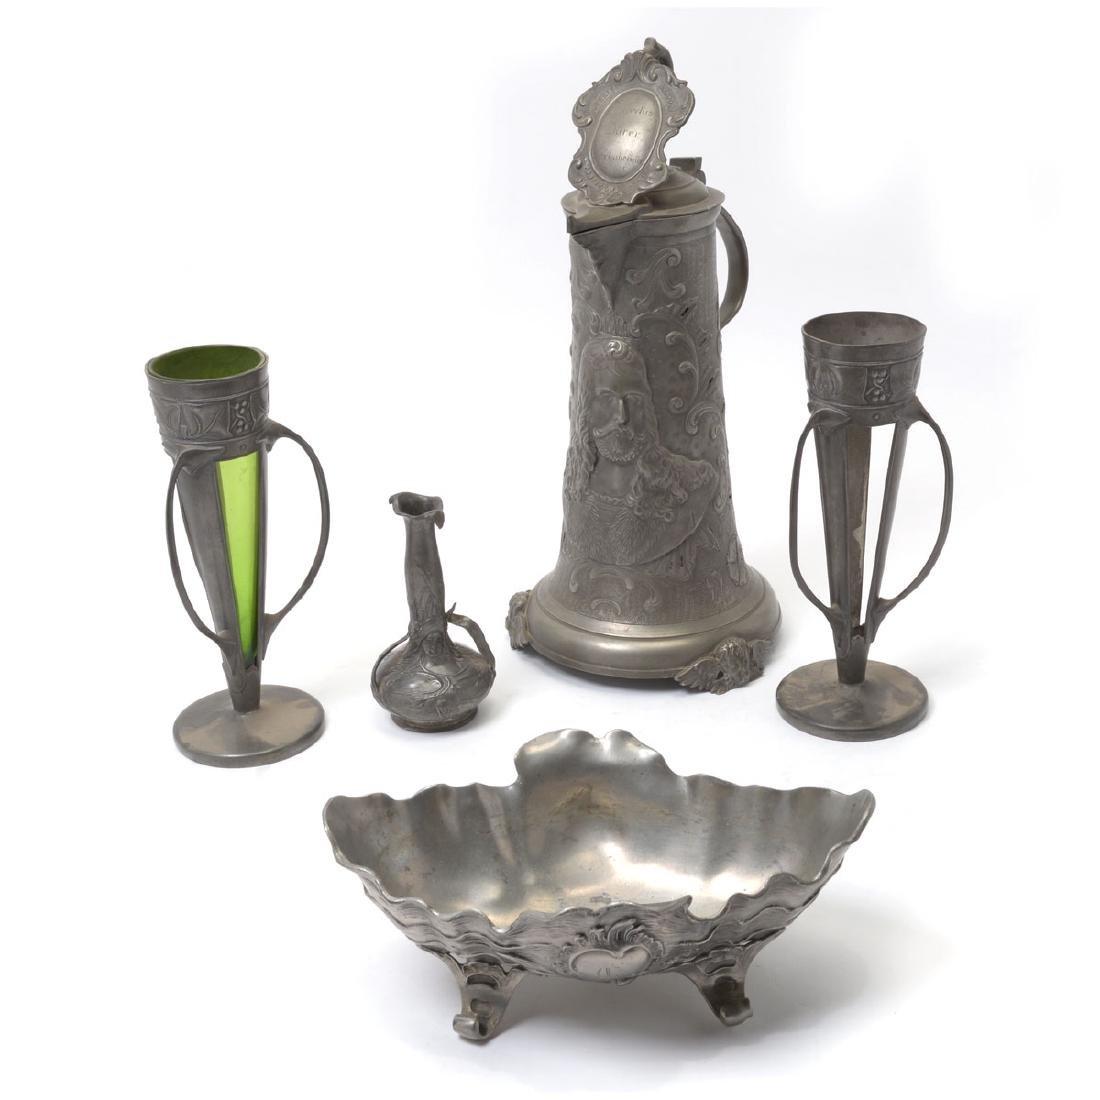 Group of Art Nouveau Pewter Items